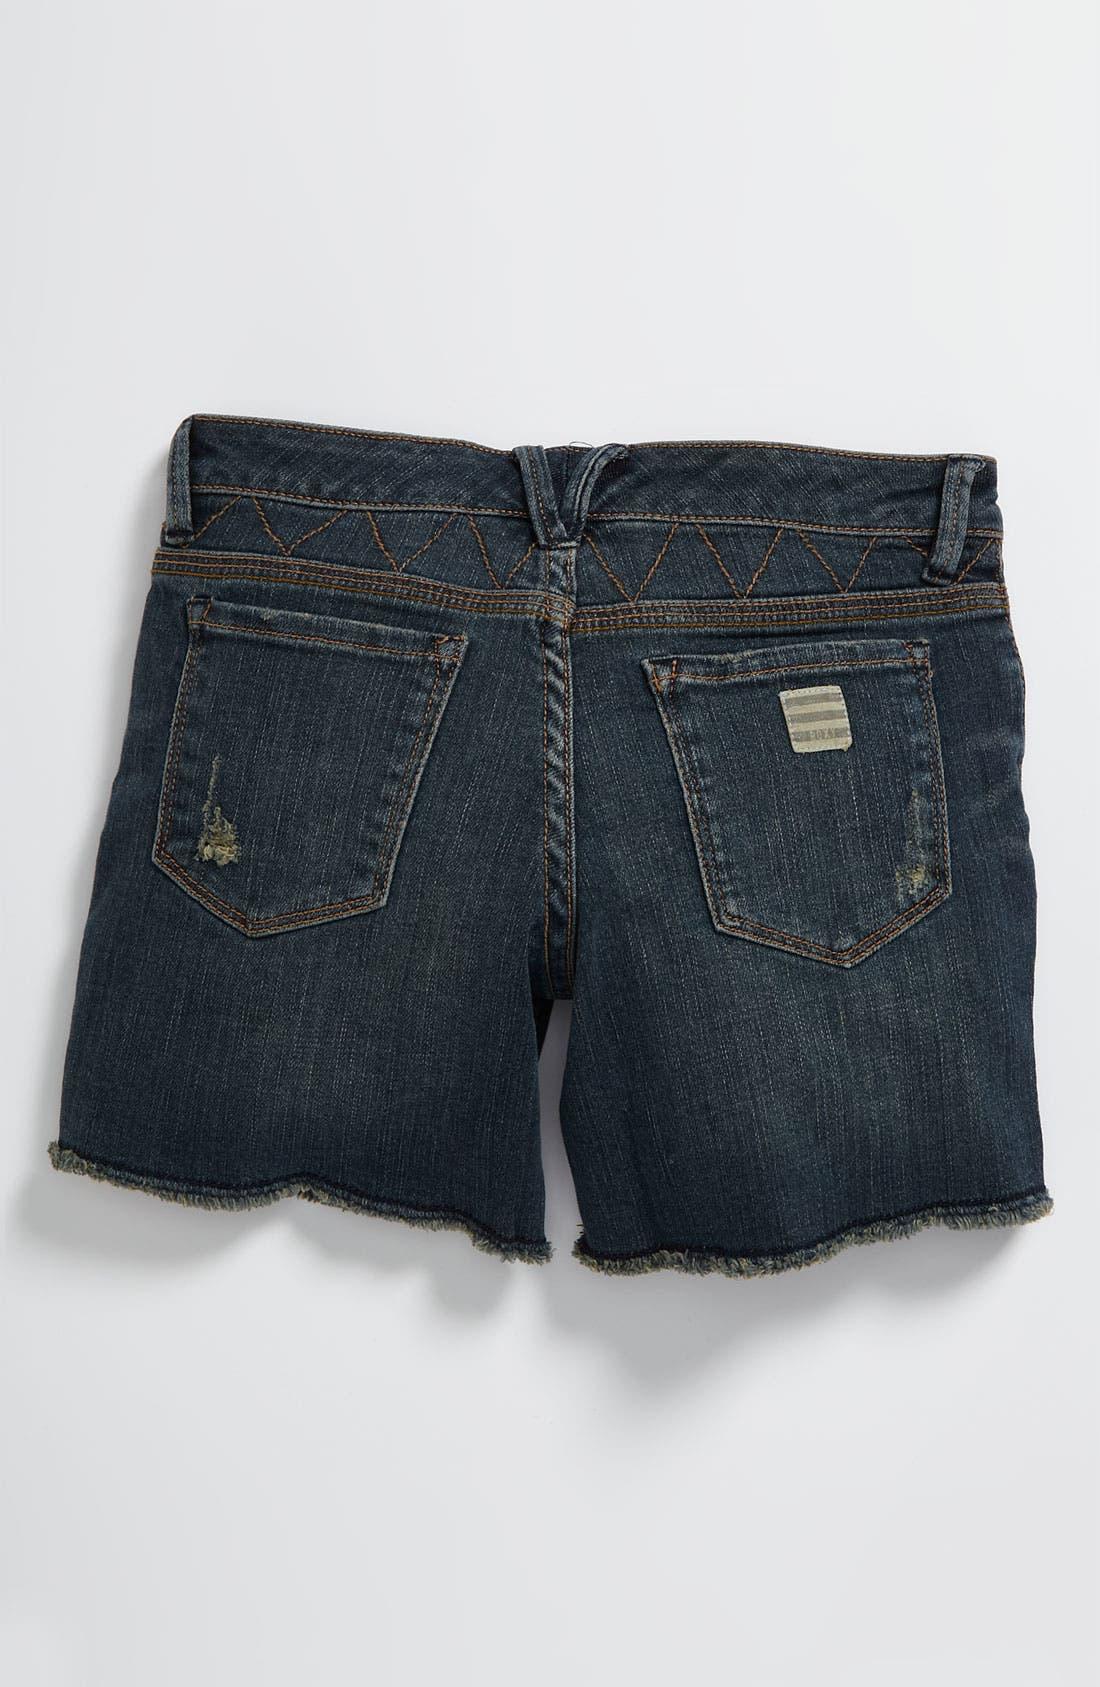 Alternate Image 1 Selected - Roxy Denim Shorts (Big Girls)